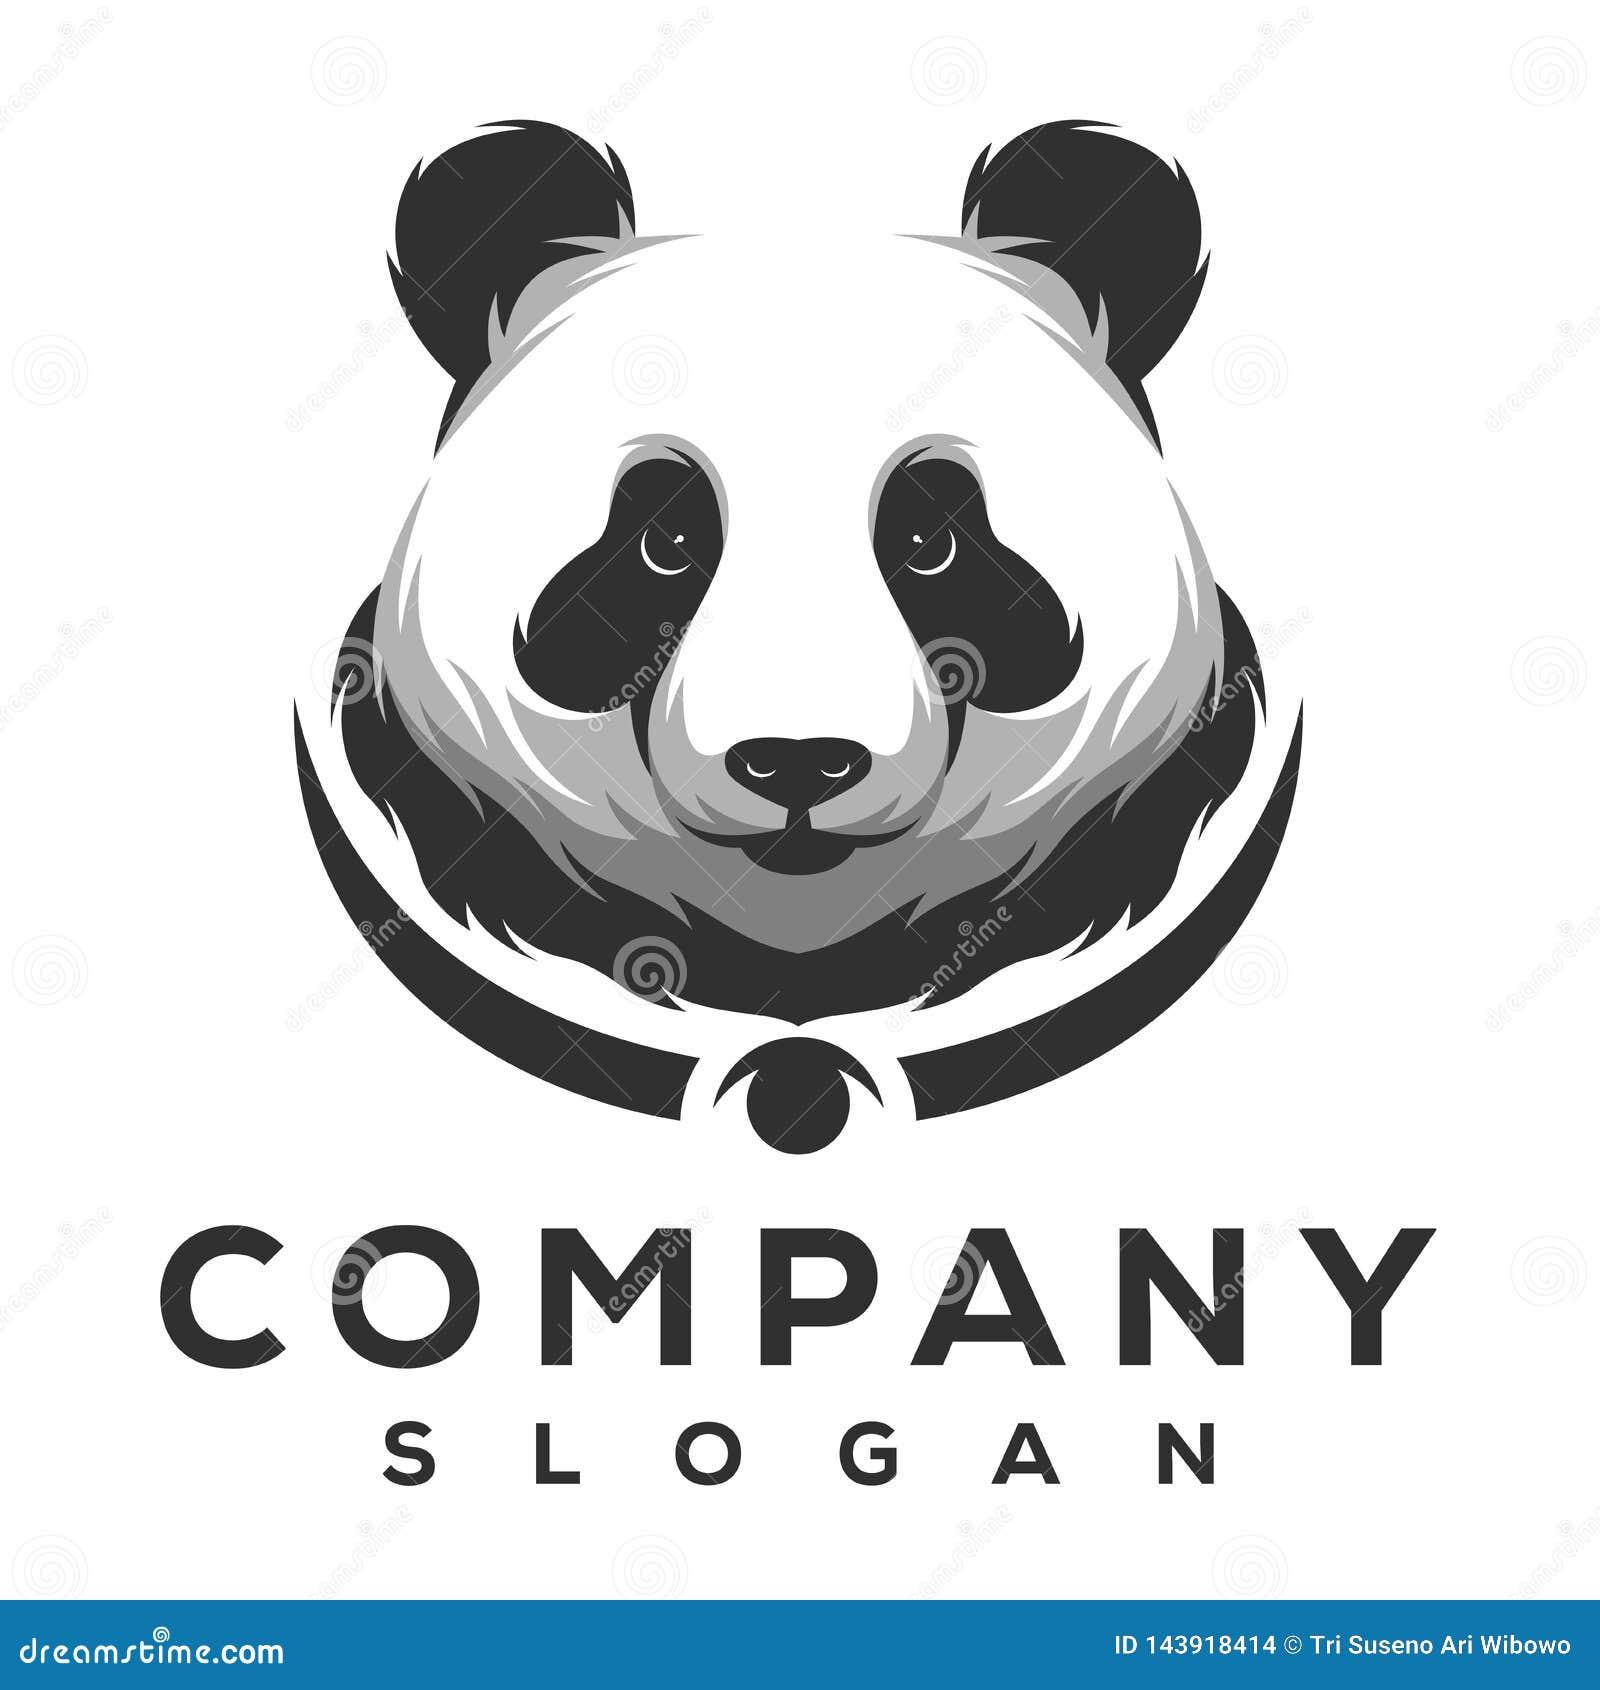 Pandalogoentwurf gebrauchsfertig